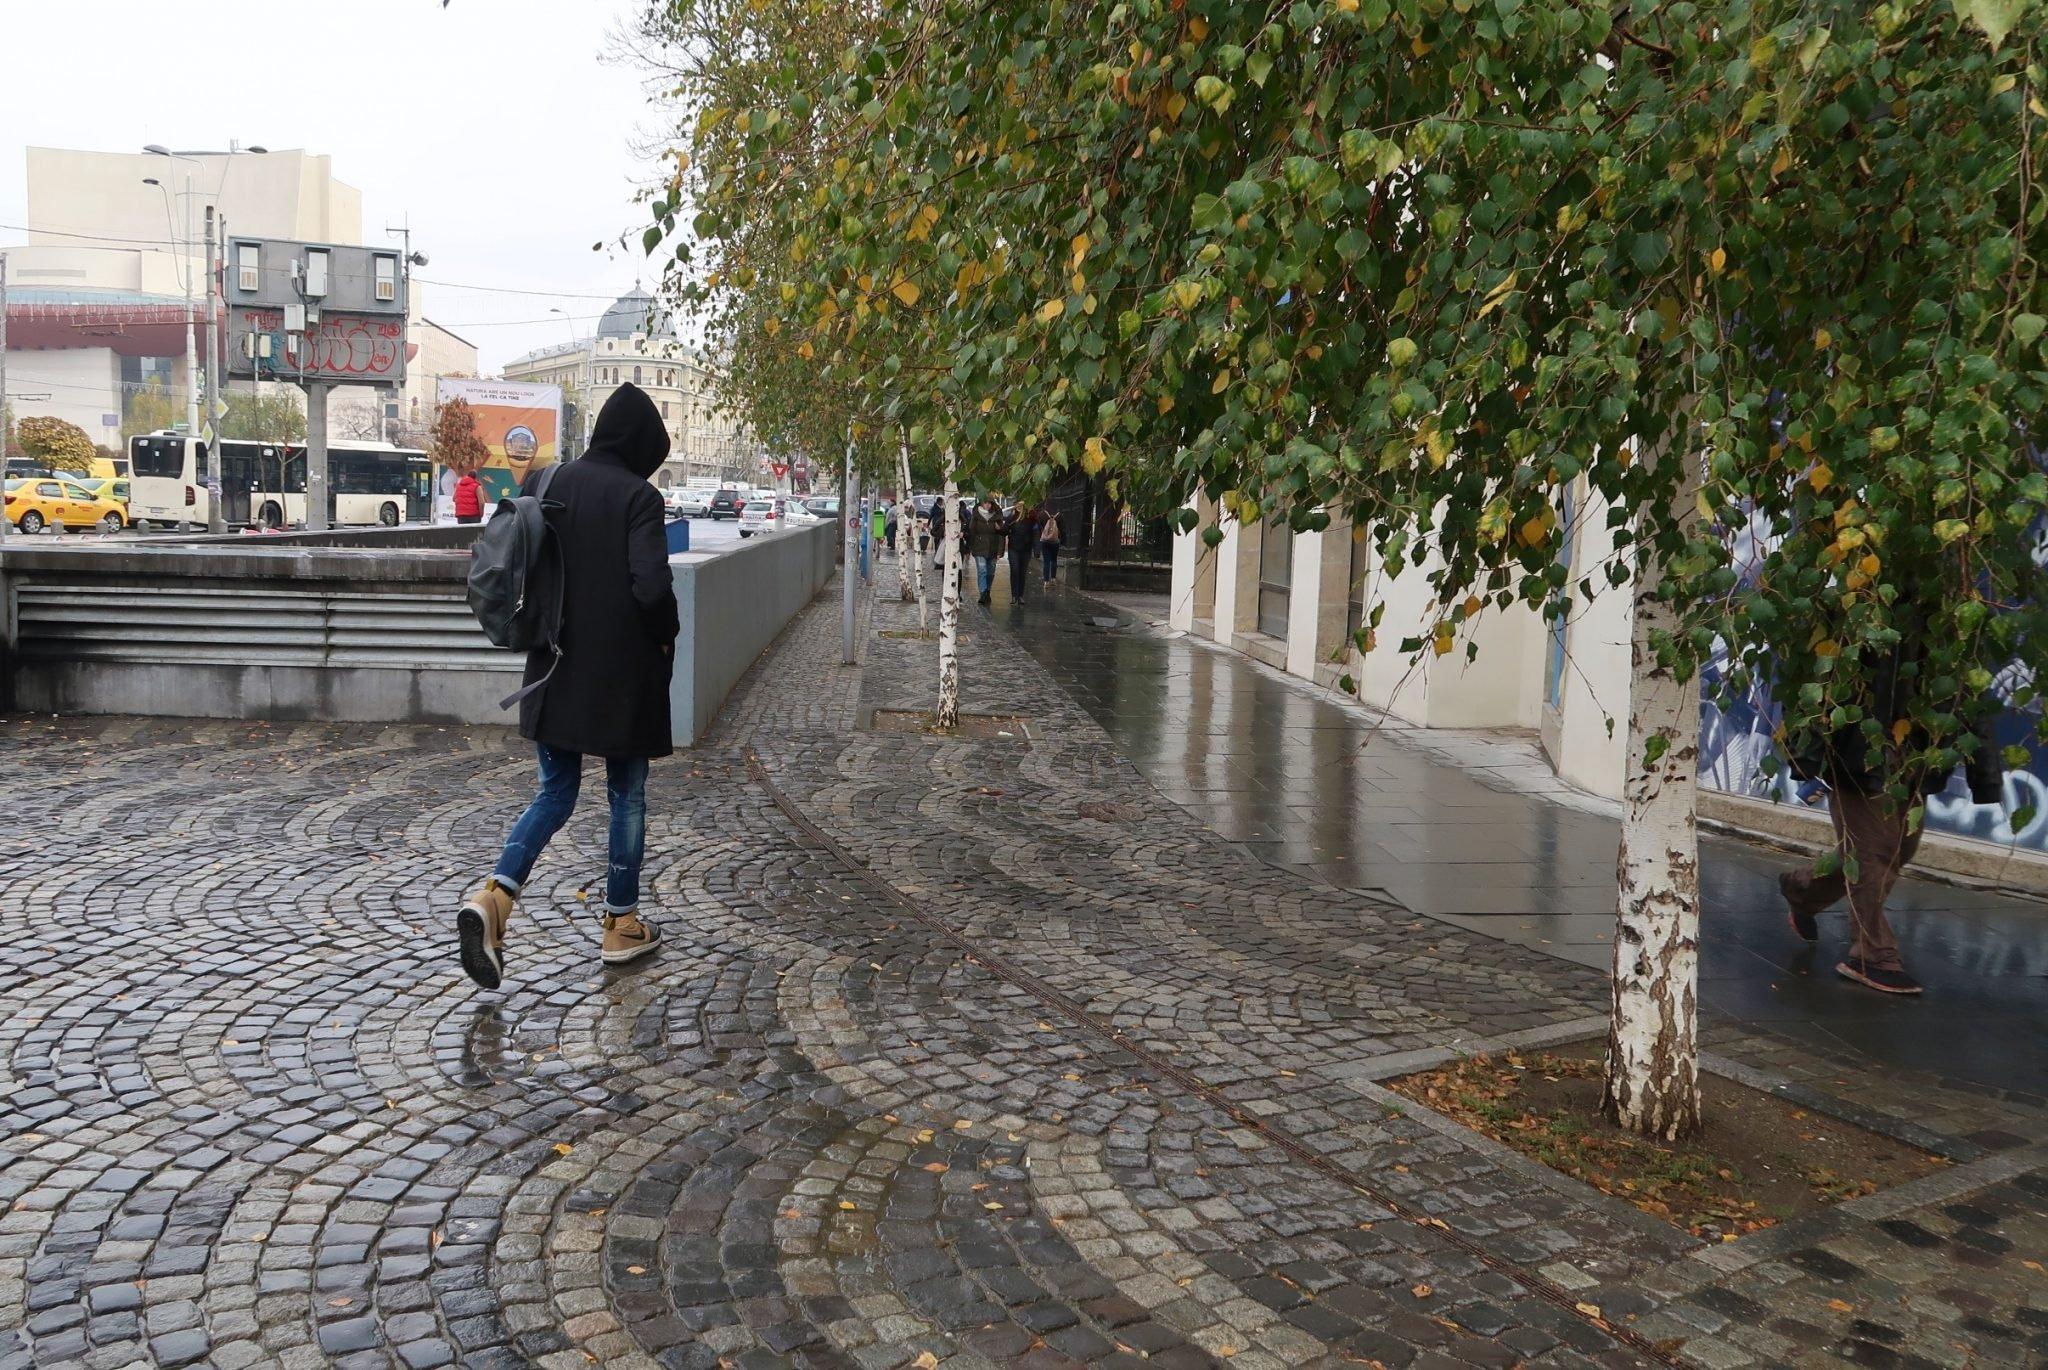 Bukarest jalankulkija